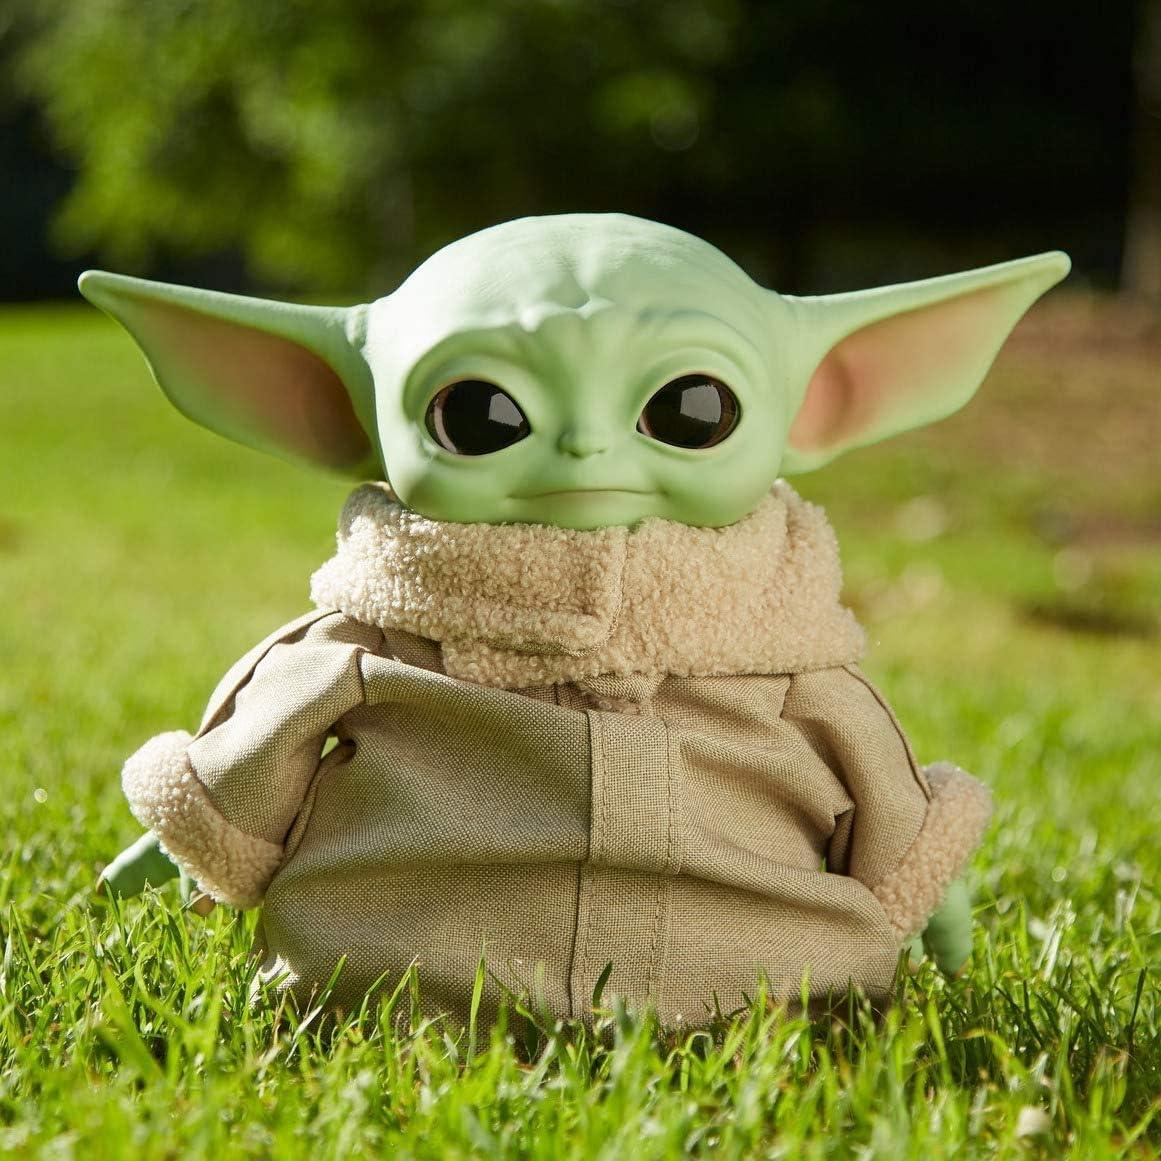 Disney Purchase Star Wars Baby El Paso Mall Yoda the Plush Tall 11